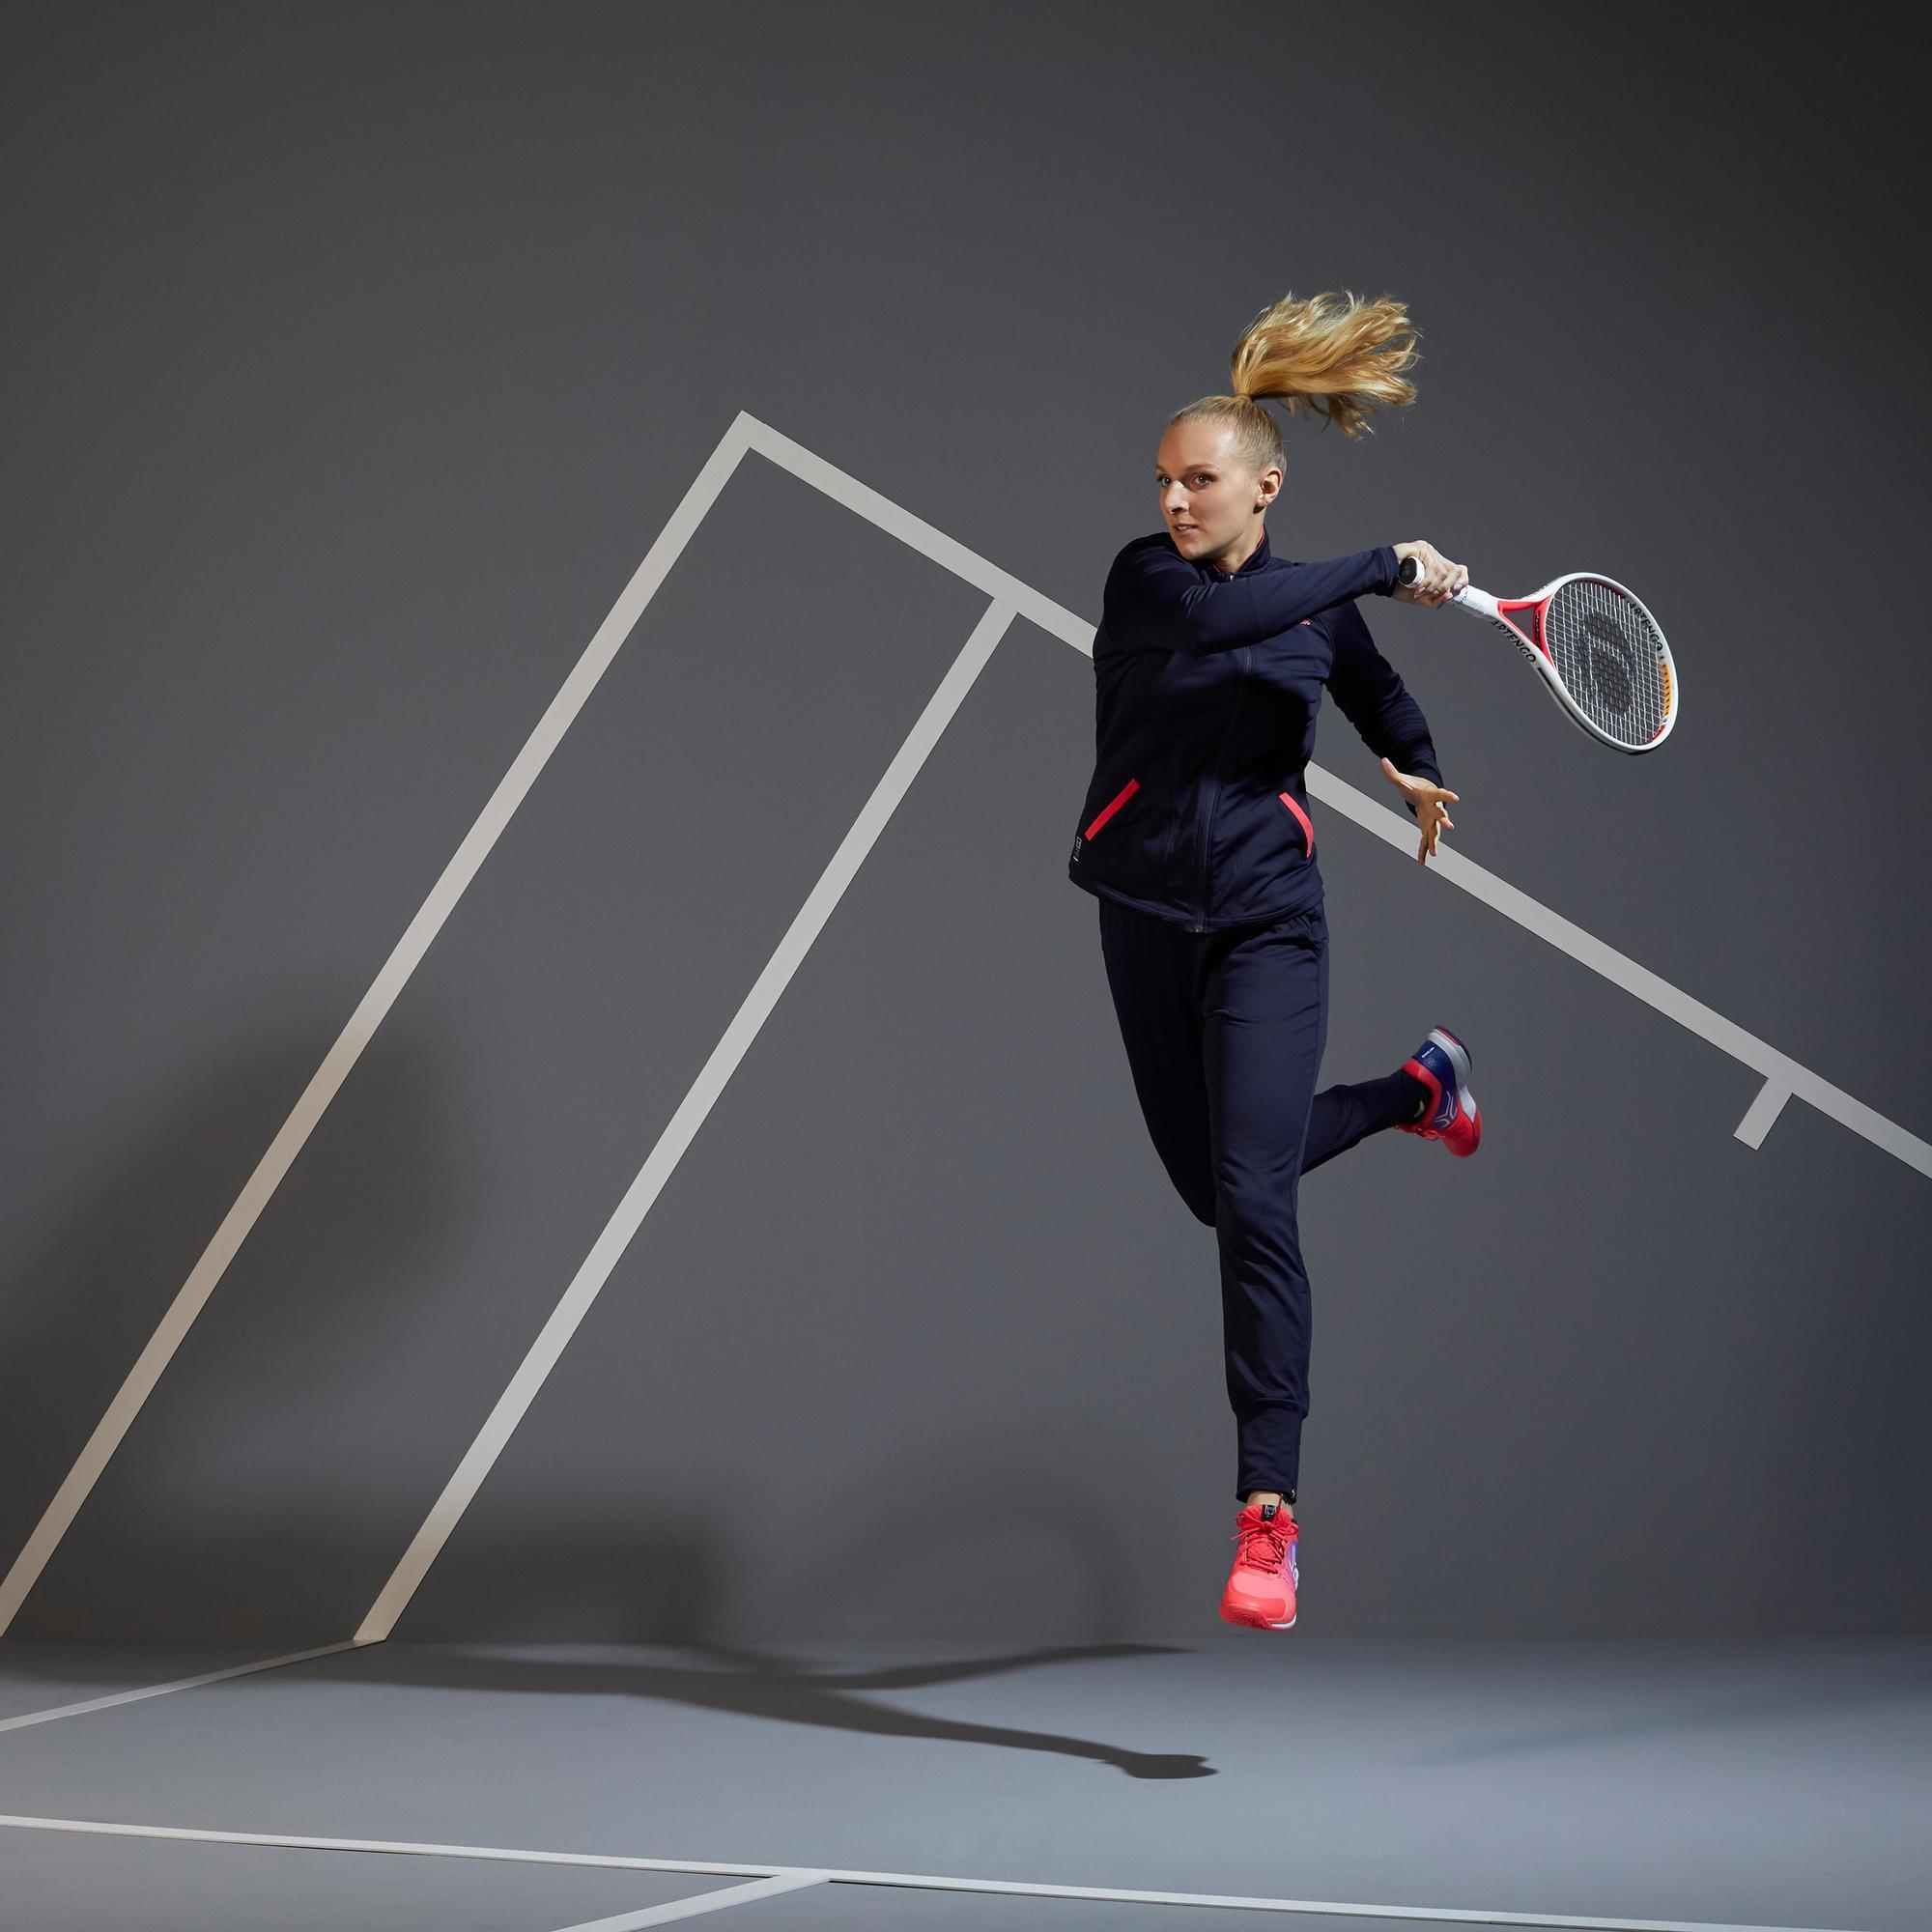 Veste de tennis femme